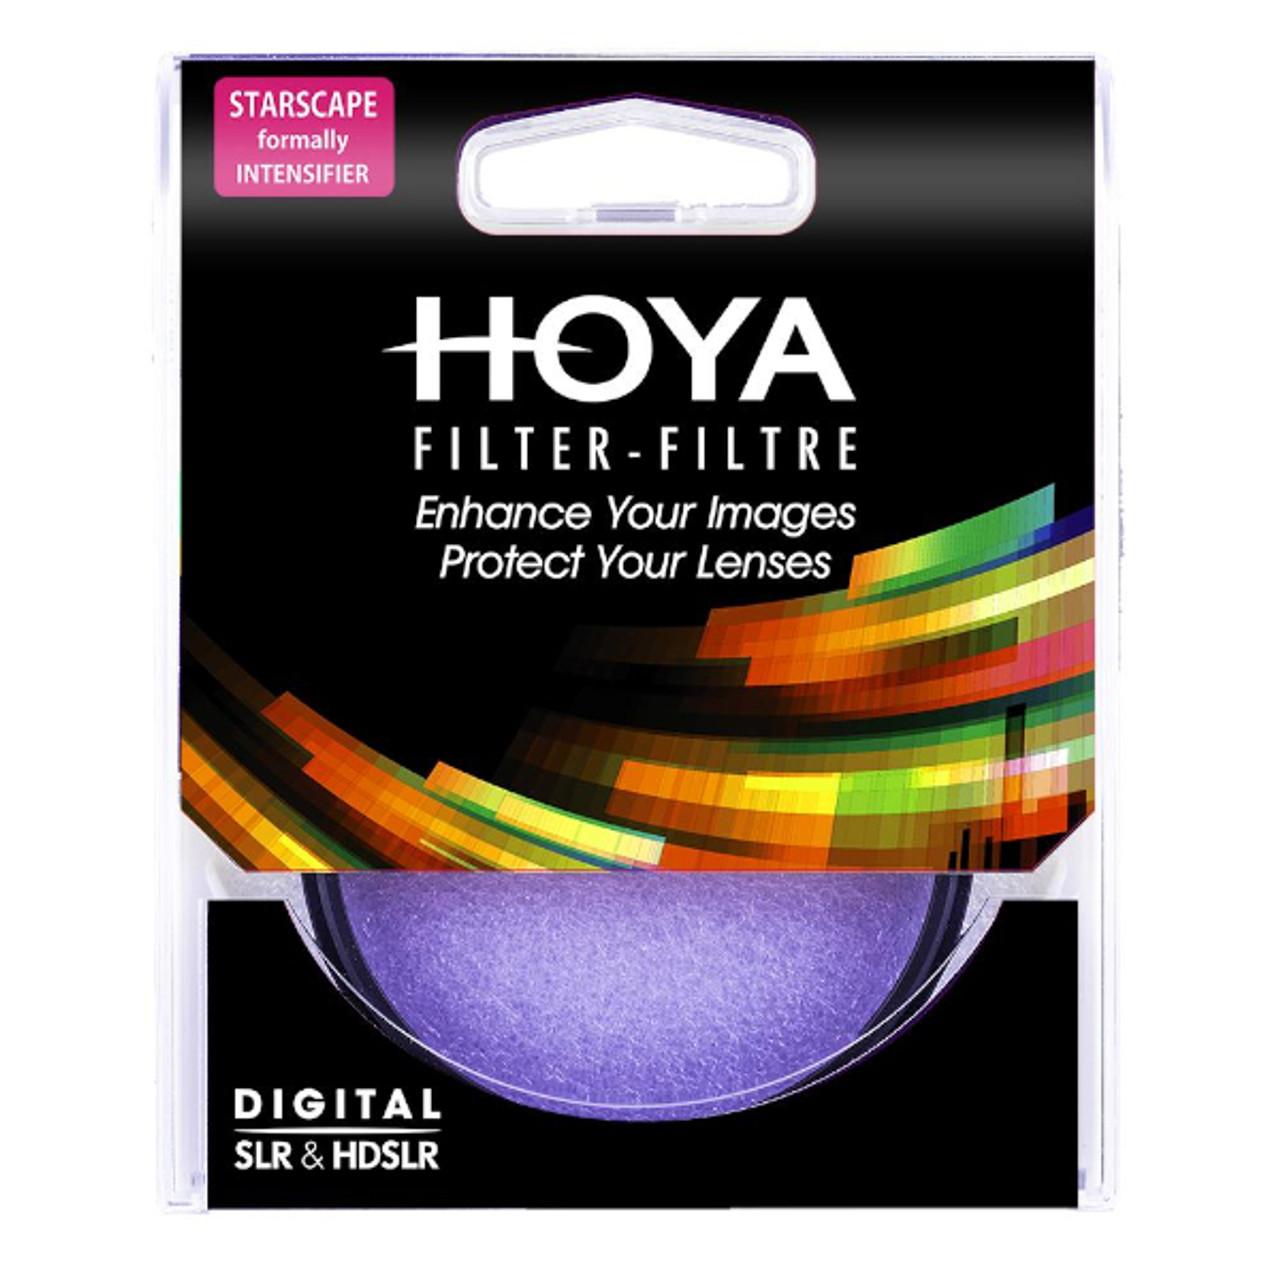 Hoya 82mm Starscape Light Pollution Filter (Intensifier)